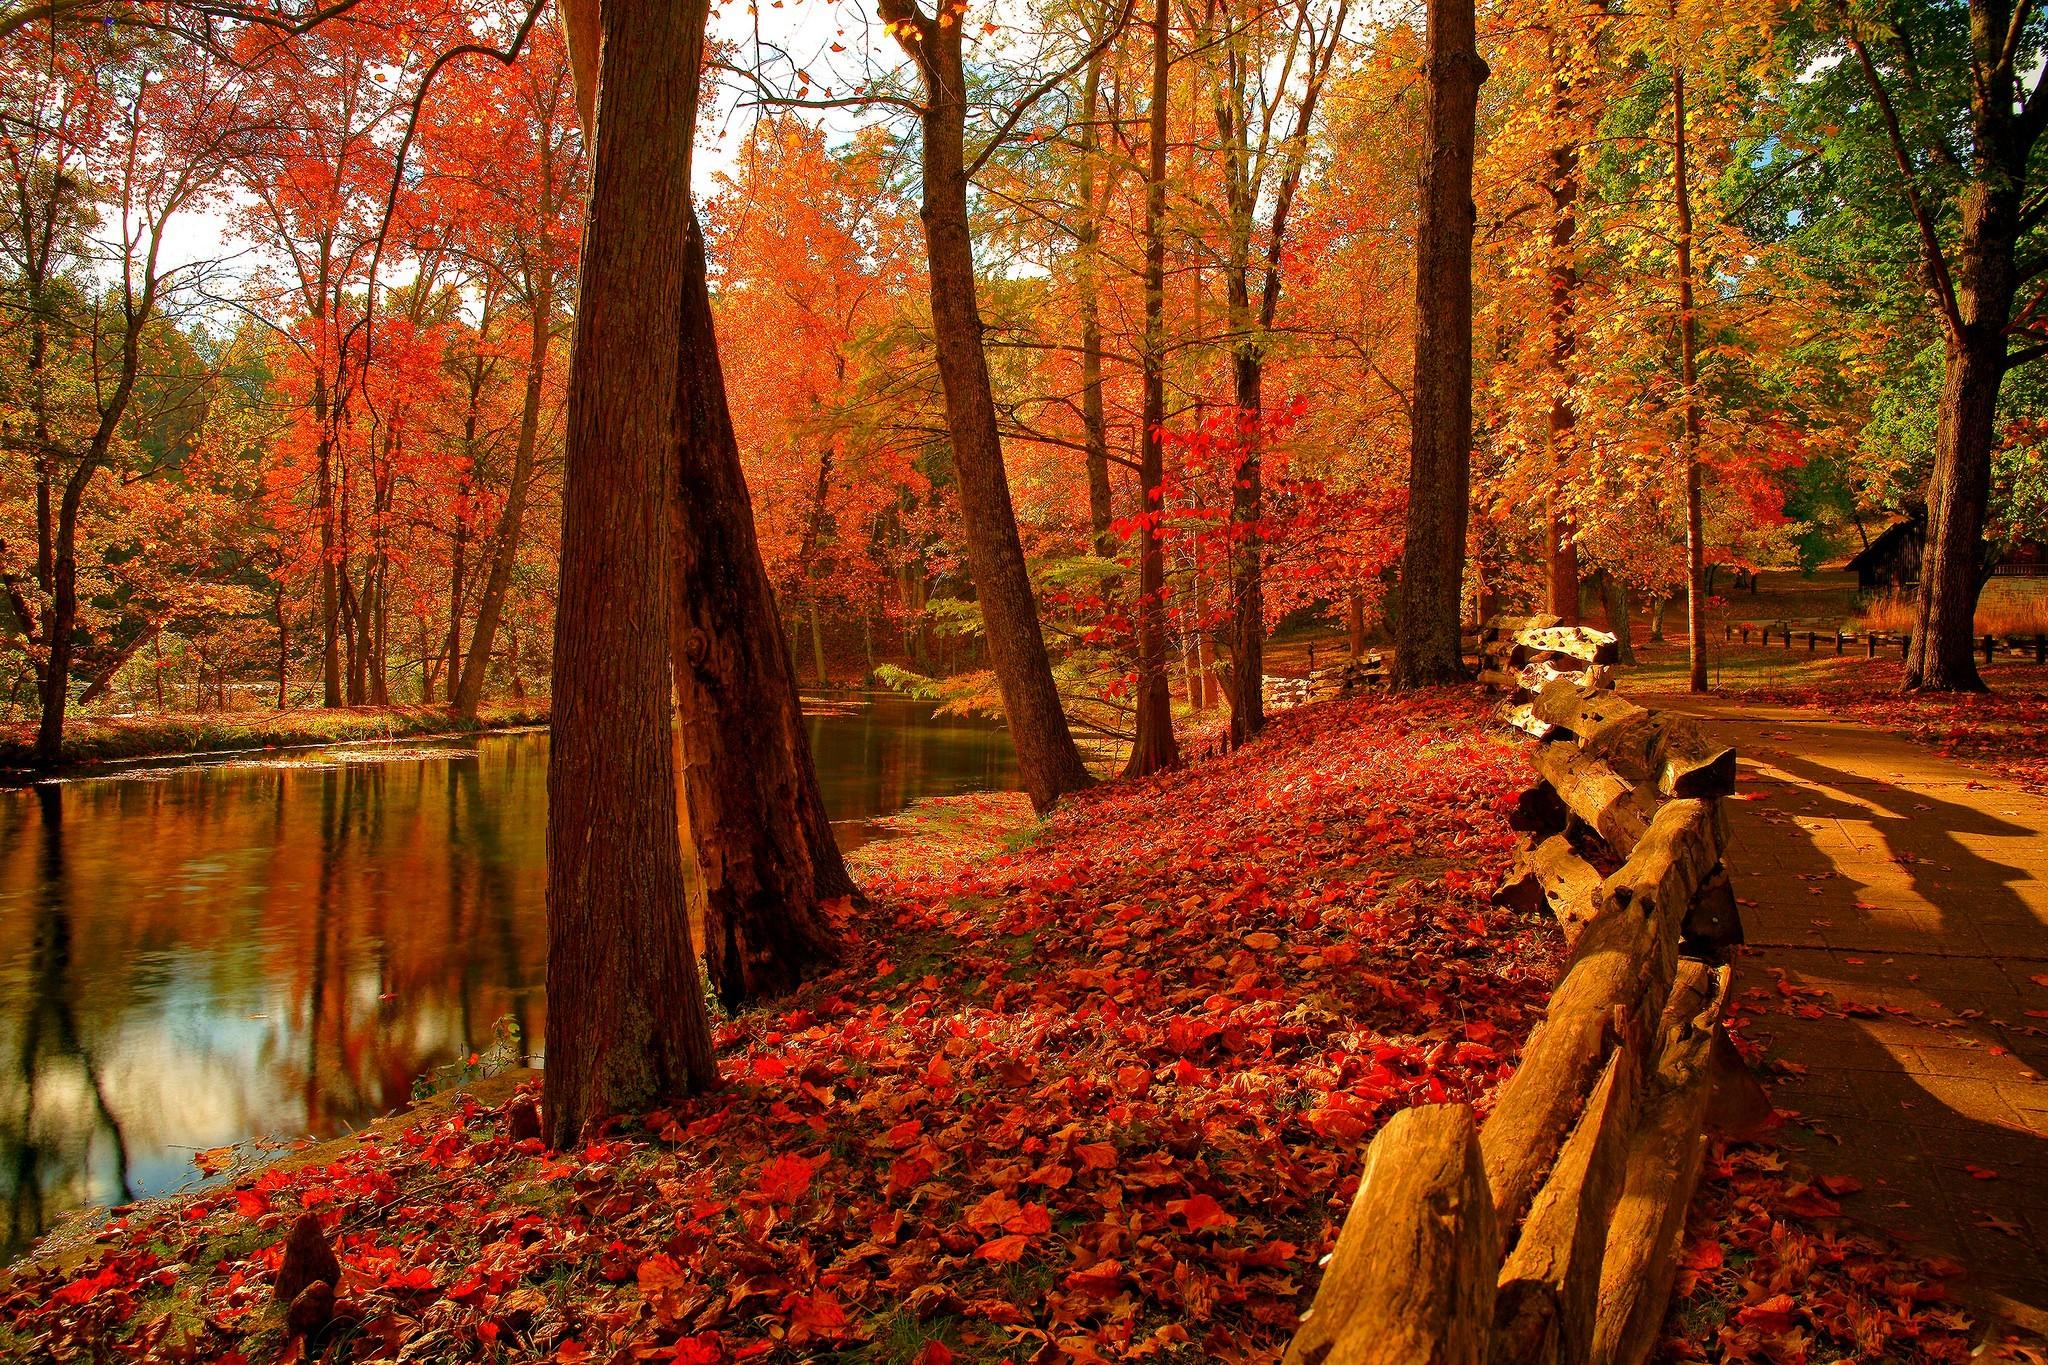 Fall Wallpaper Screensavers Fondos Oto 241 O Wallpapers Autumn Fondos De Pantalla De Oto 241 O